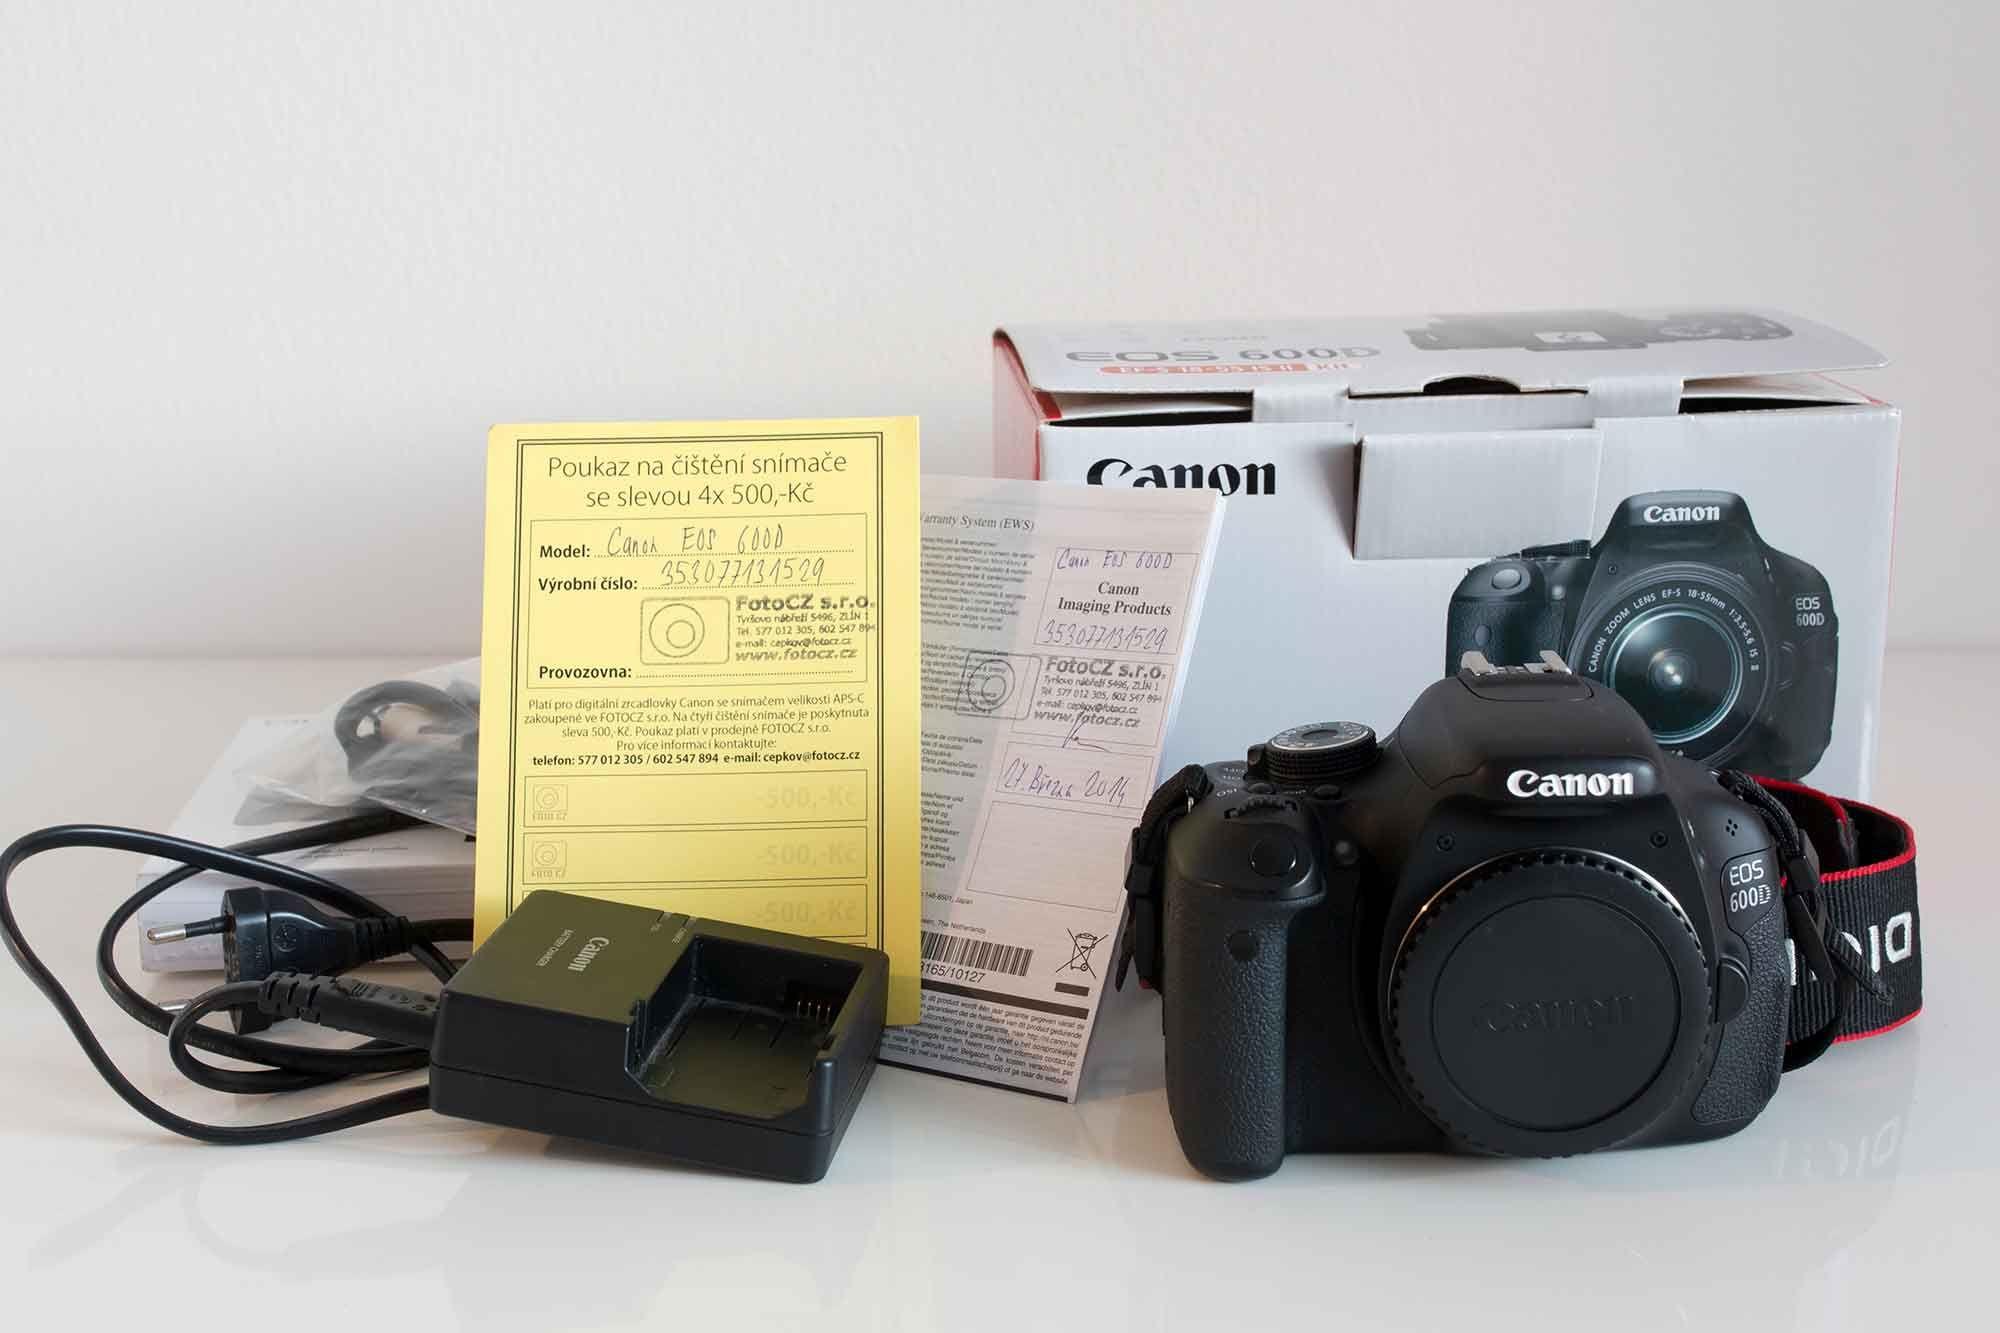 Canon EOS D600 STAV NOVéHO